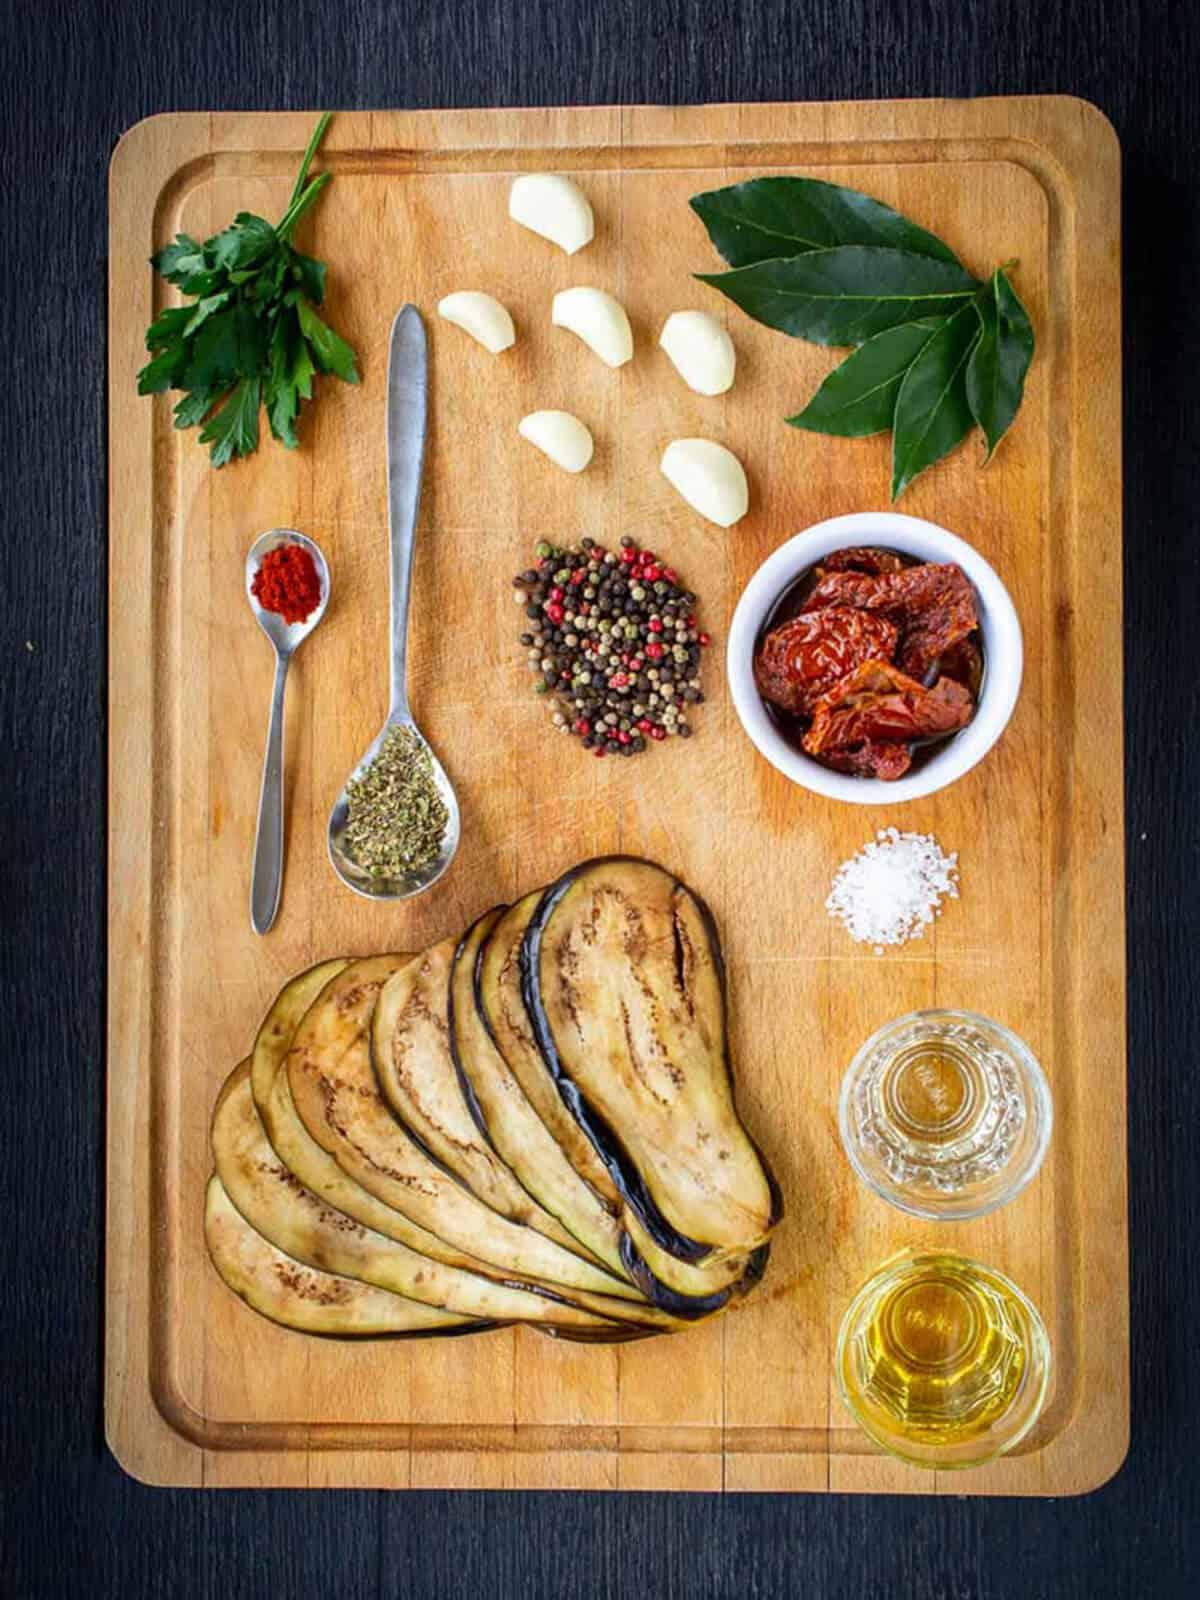 Pickled Eggplants son's version ingredients